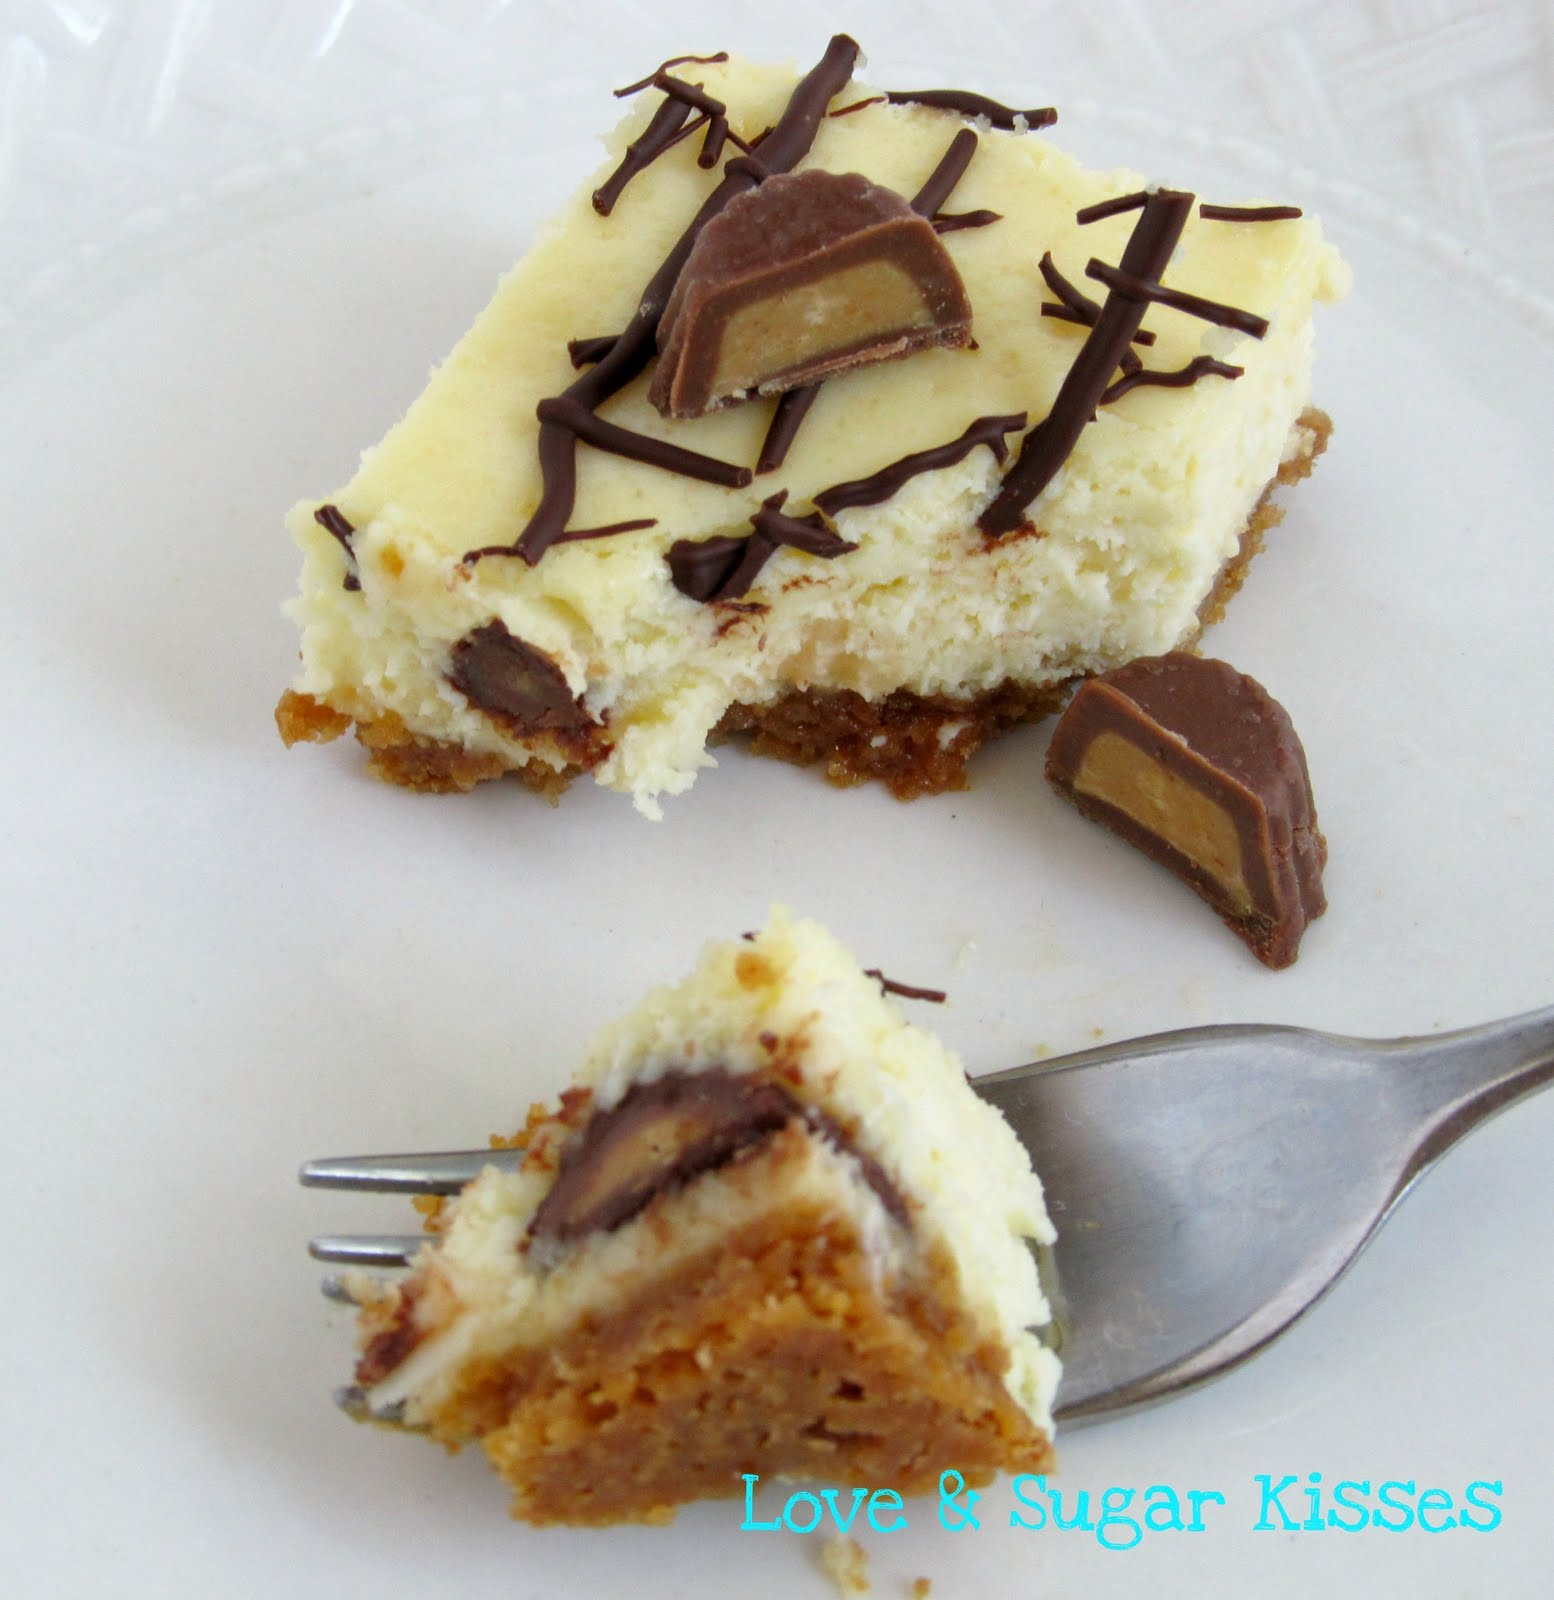 Love & Sugar Kisses: Peanut Butter Cup Cheesecake Bars